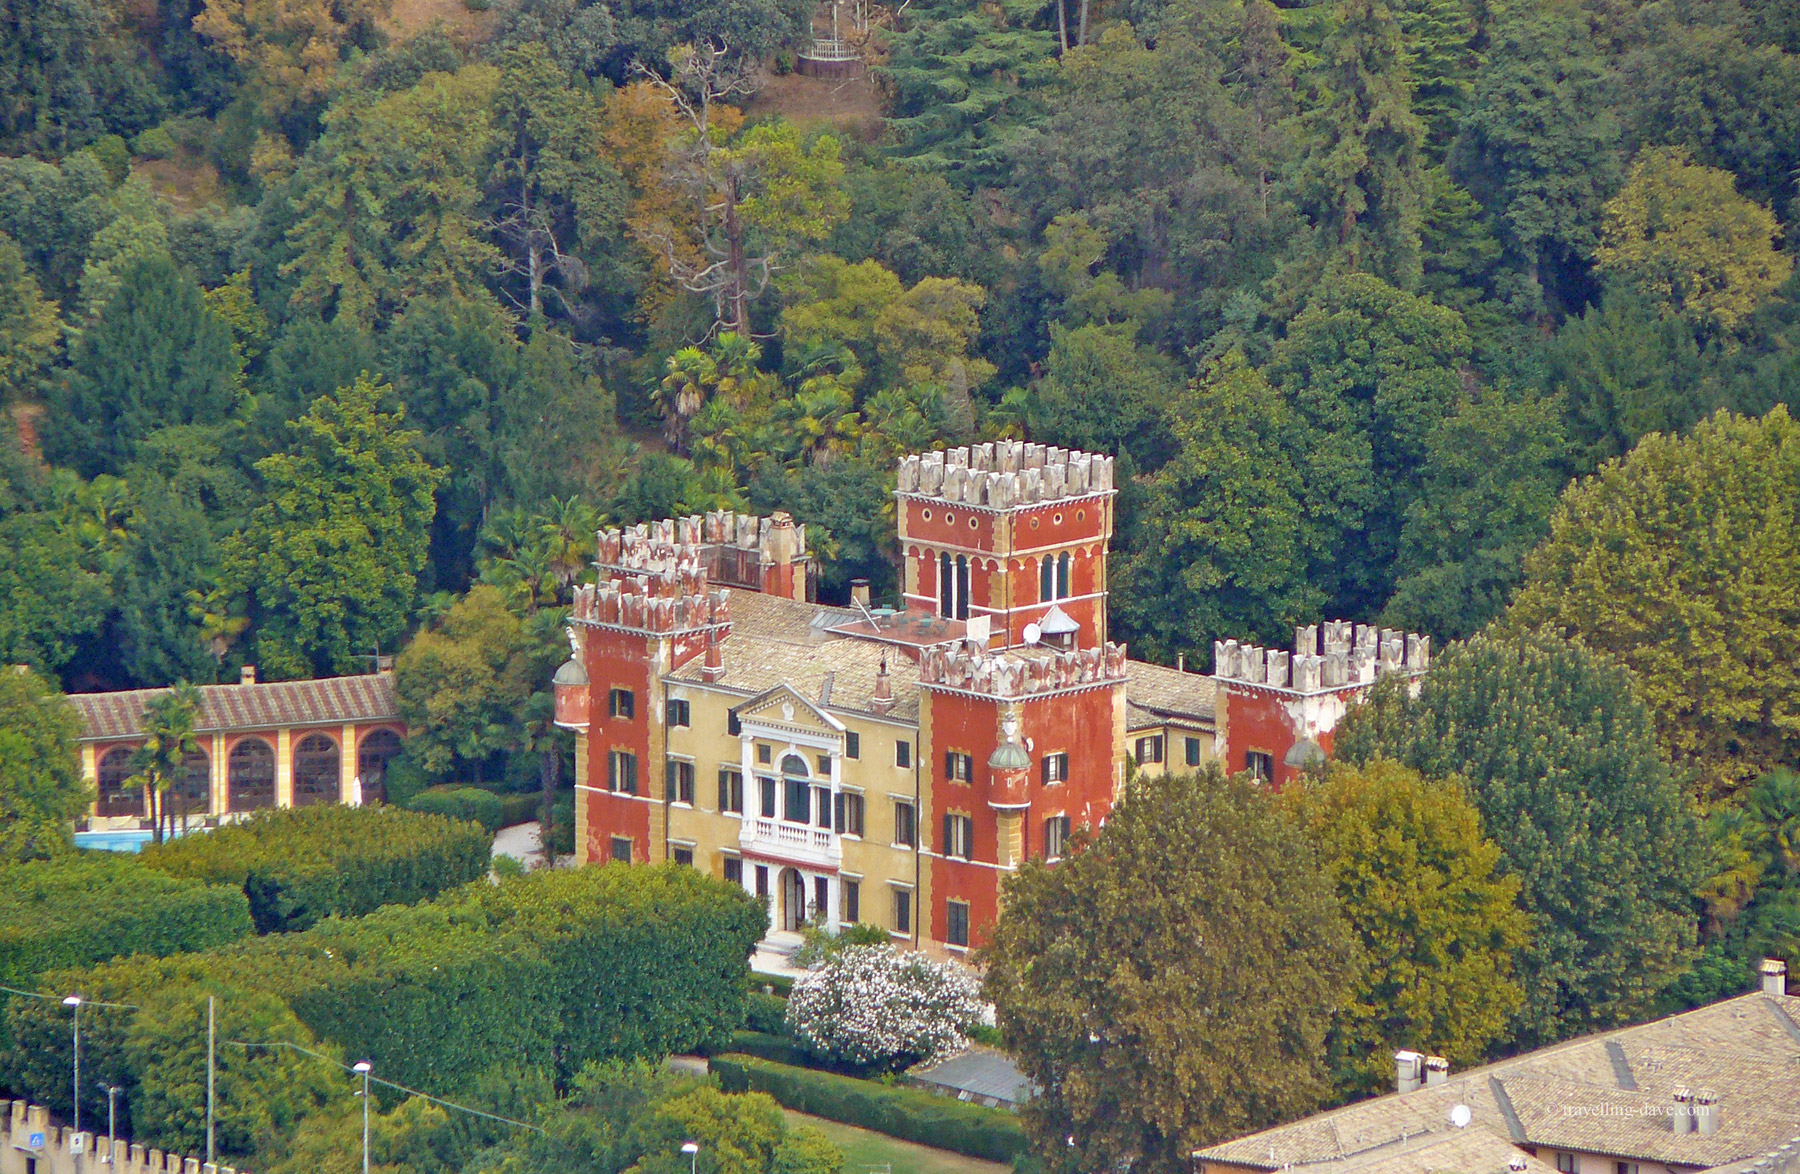 View of Villa Albertini in Garda